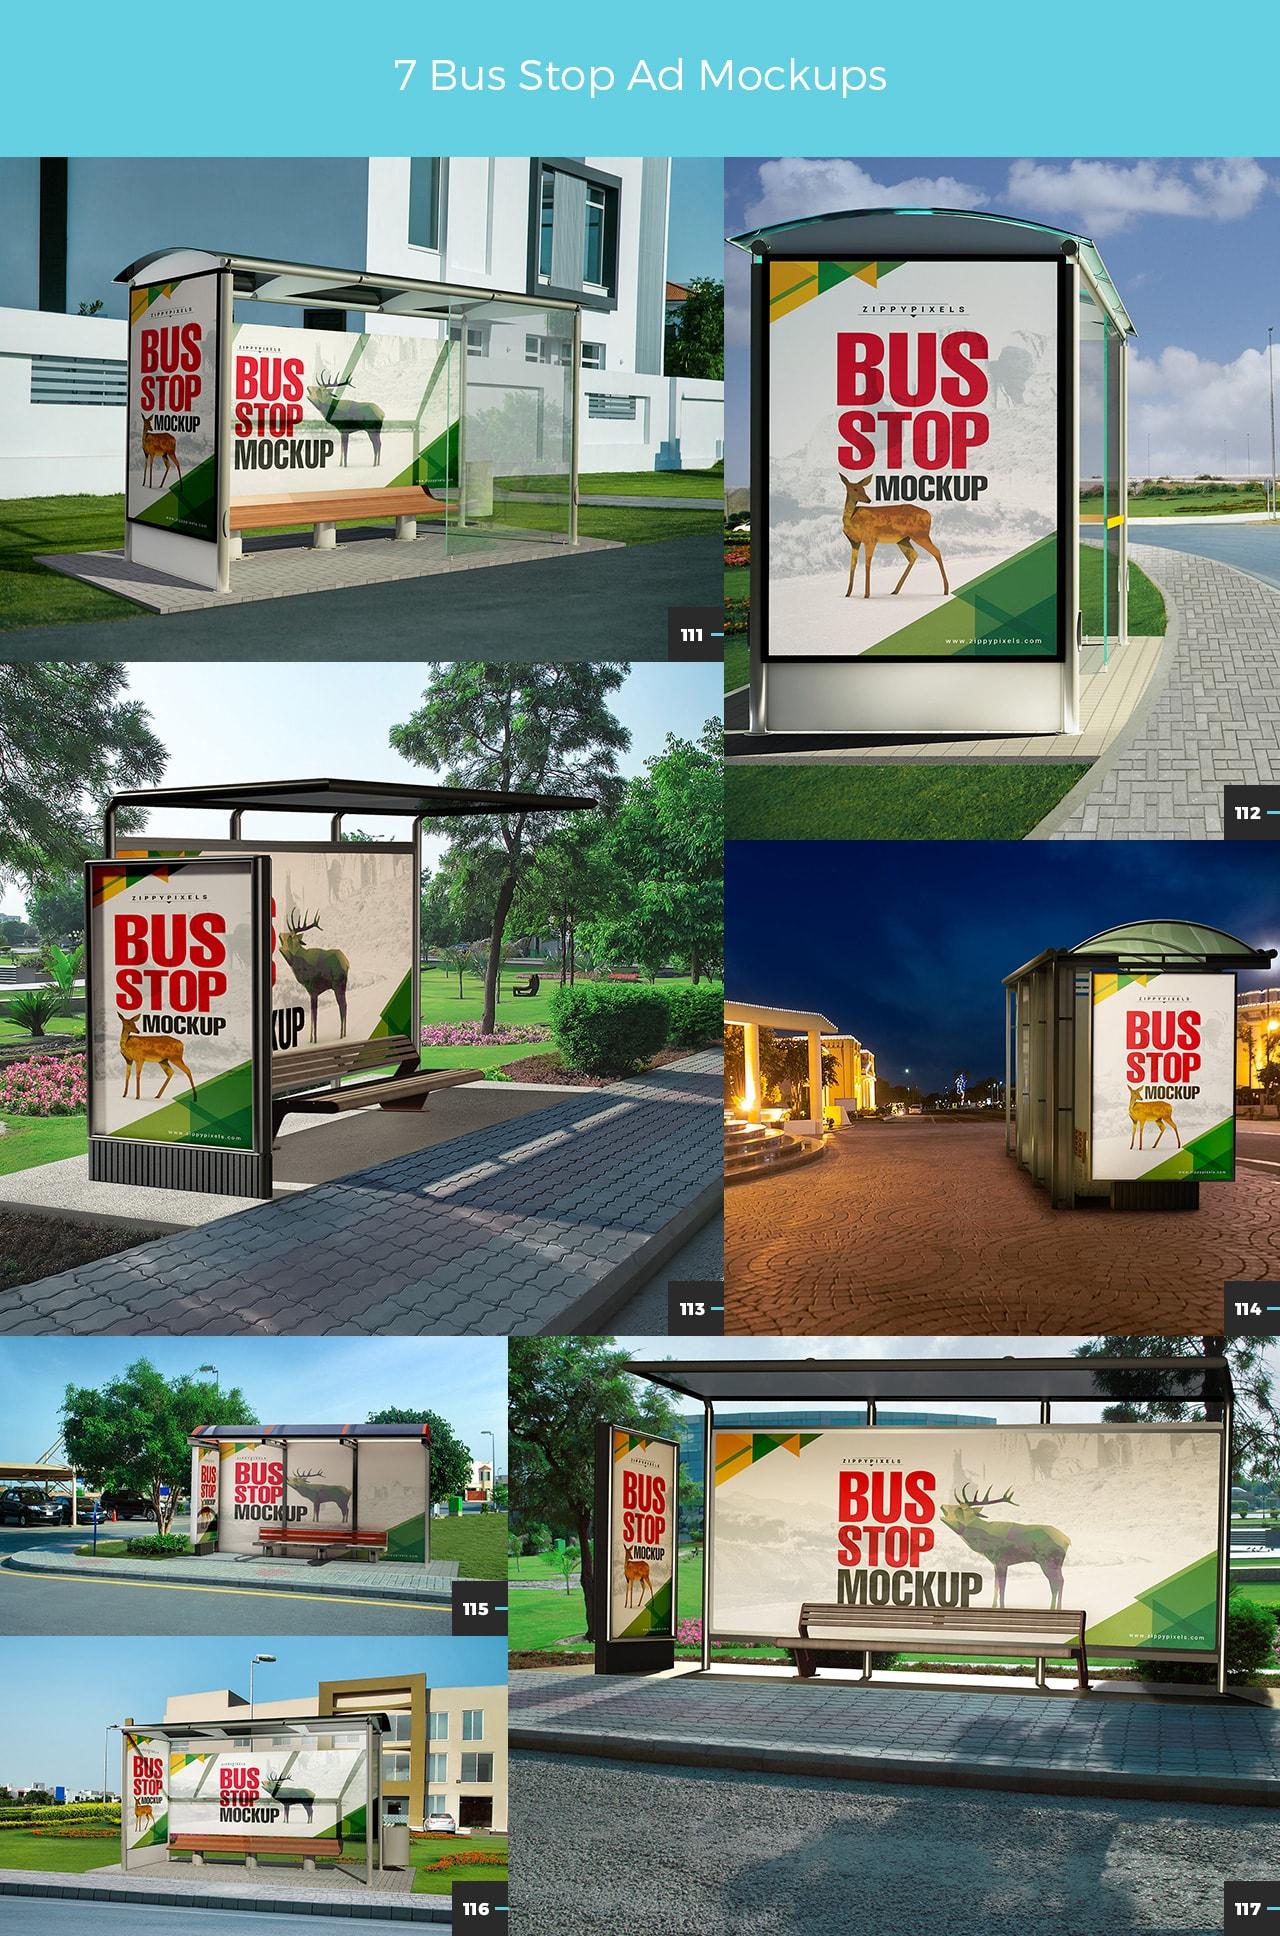 06 7 BUS STOP AD MOCKUPS